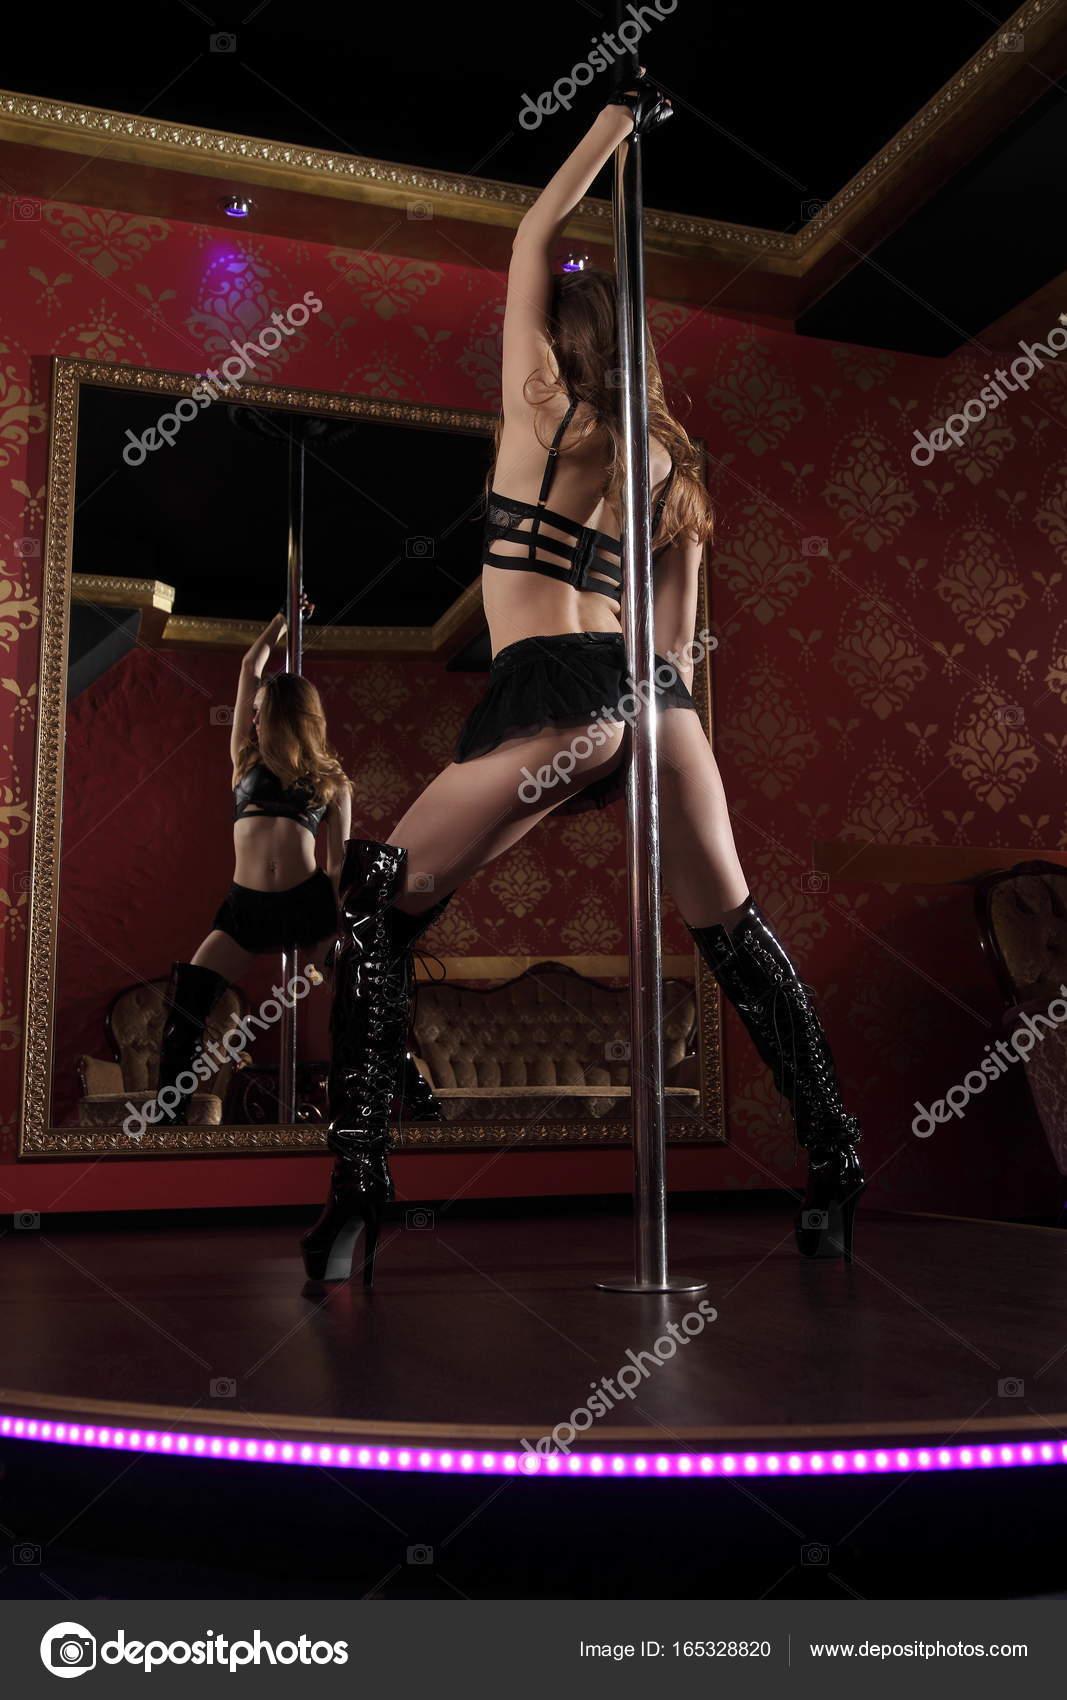 Baila Con Lenceria Porno chica joven bailando en un strip club — foto de stock